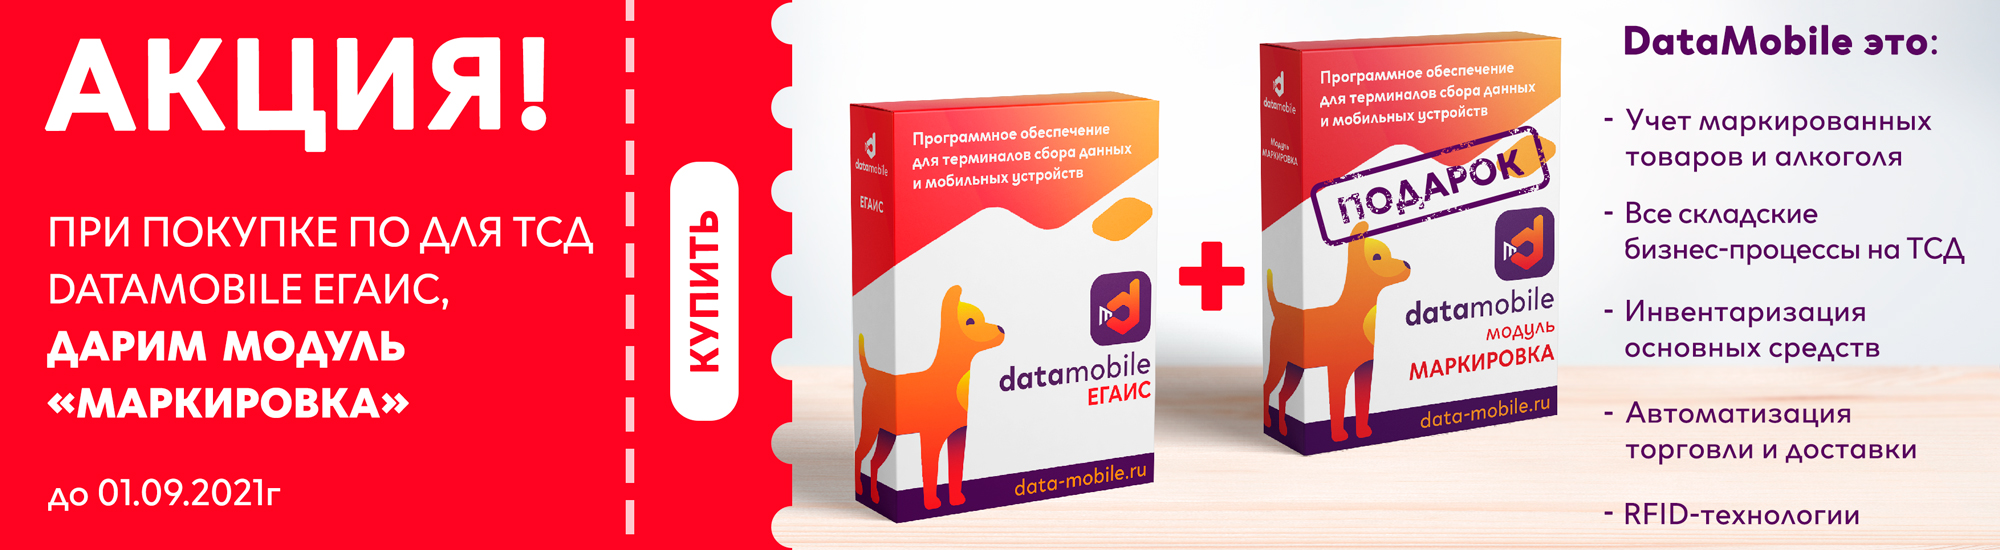 Акция DataMobile